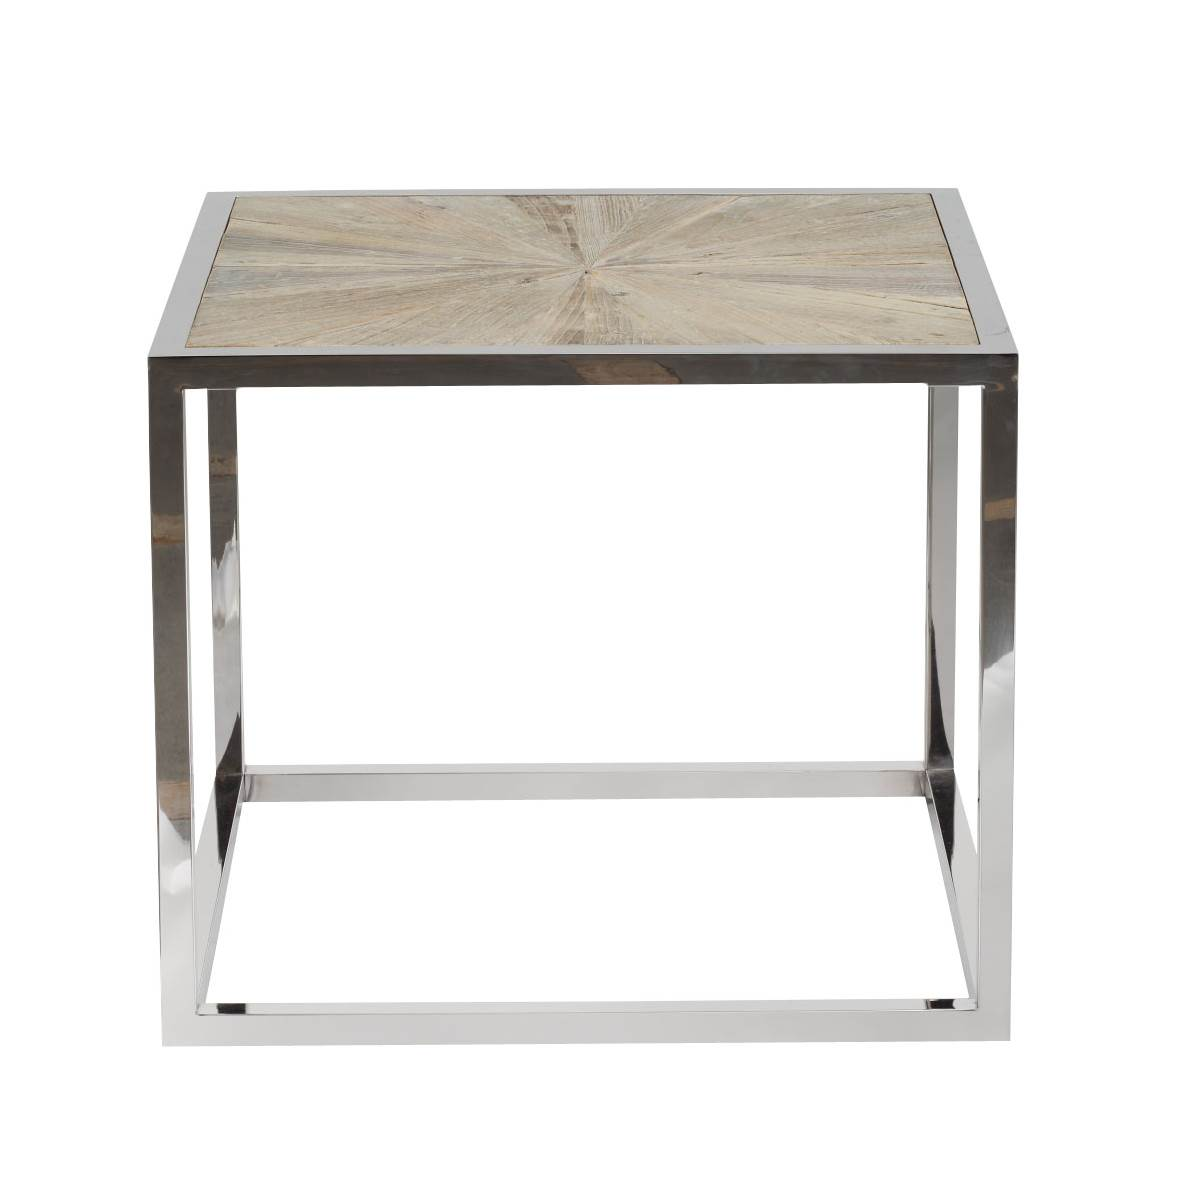 Parquet End Table - Smoke Gray - 1